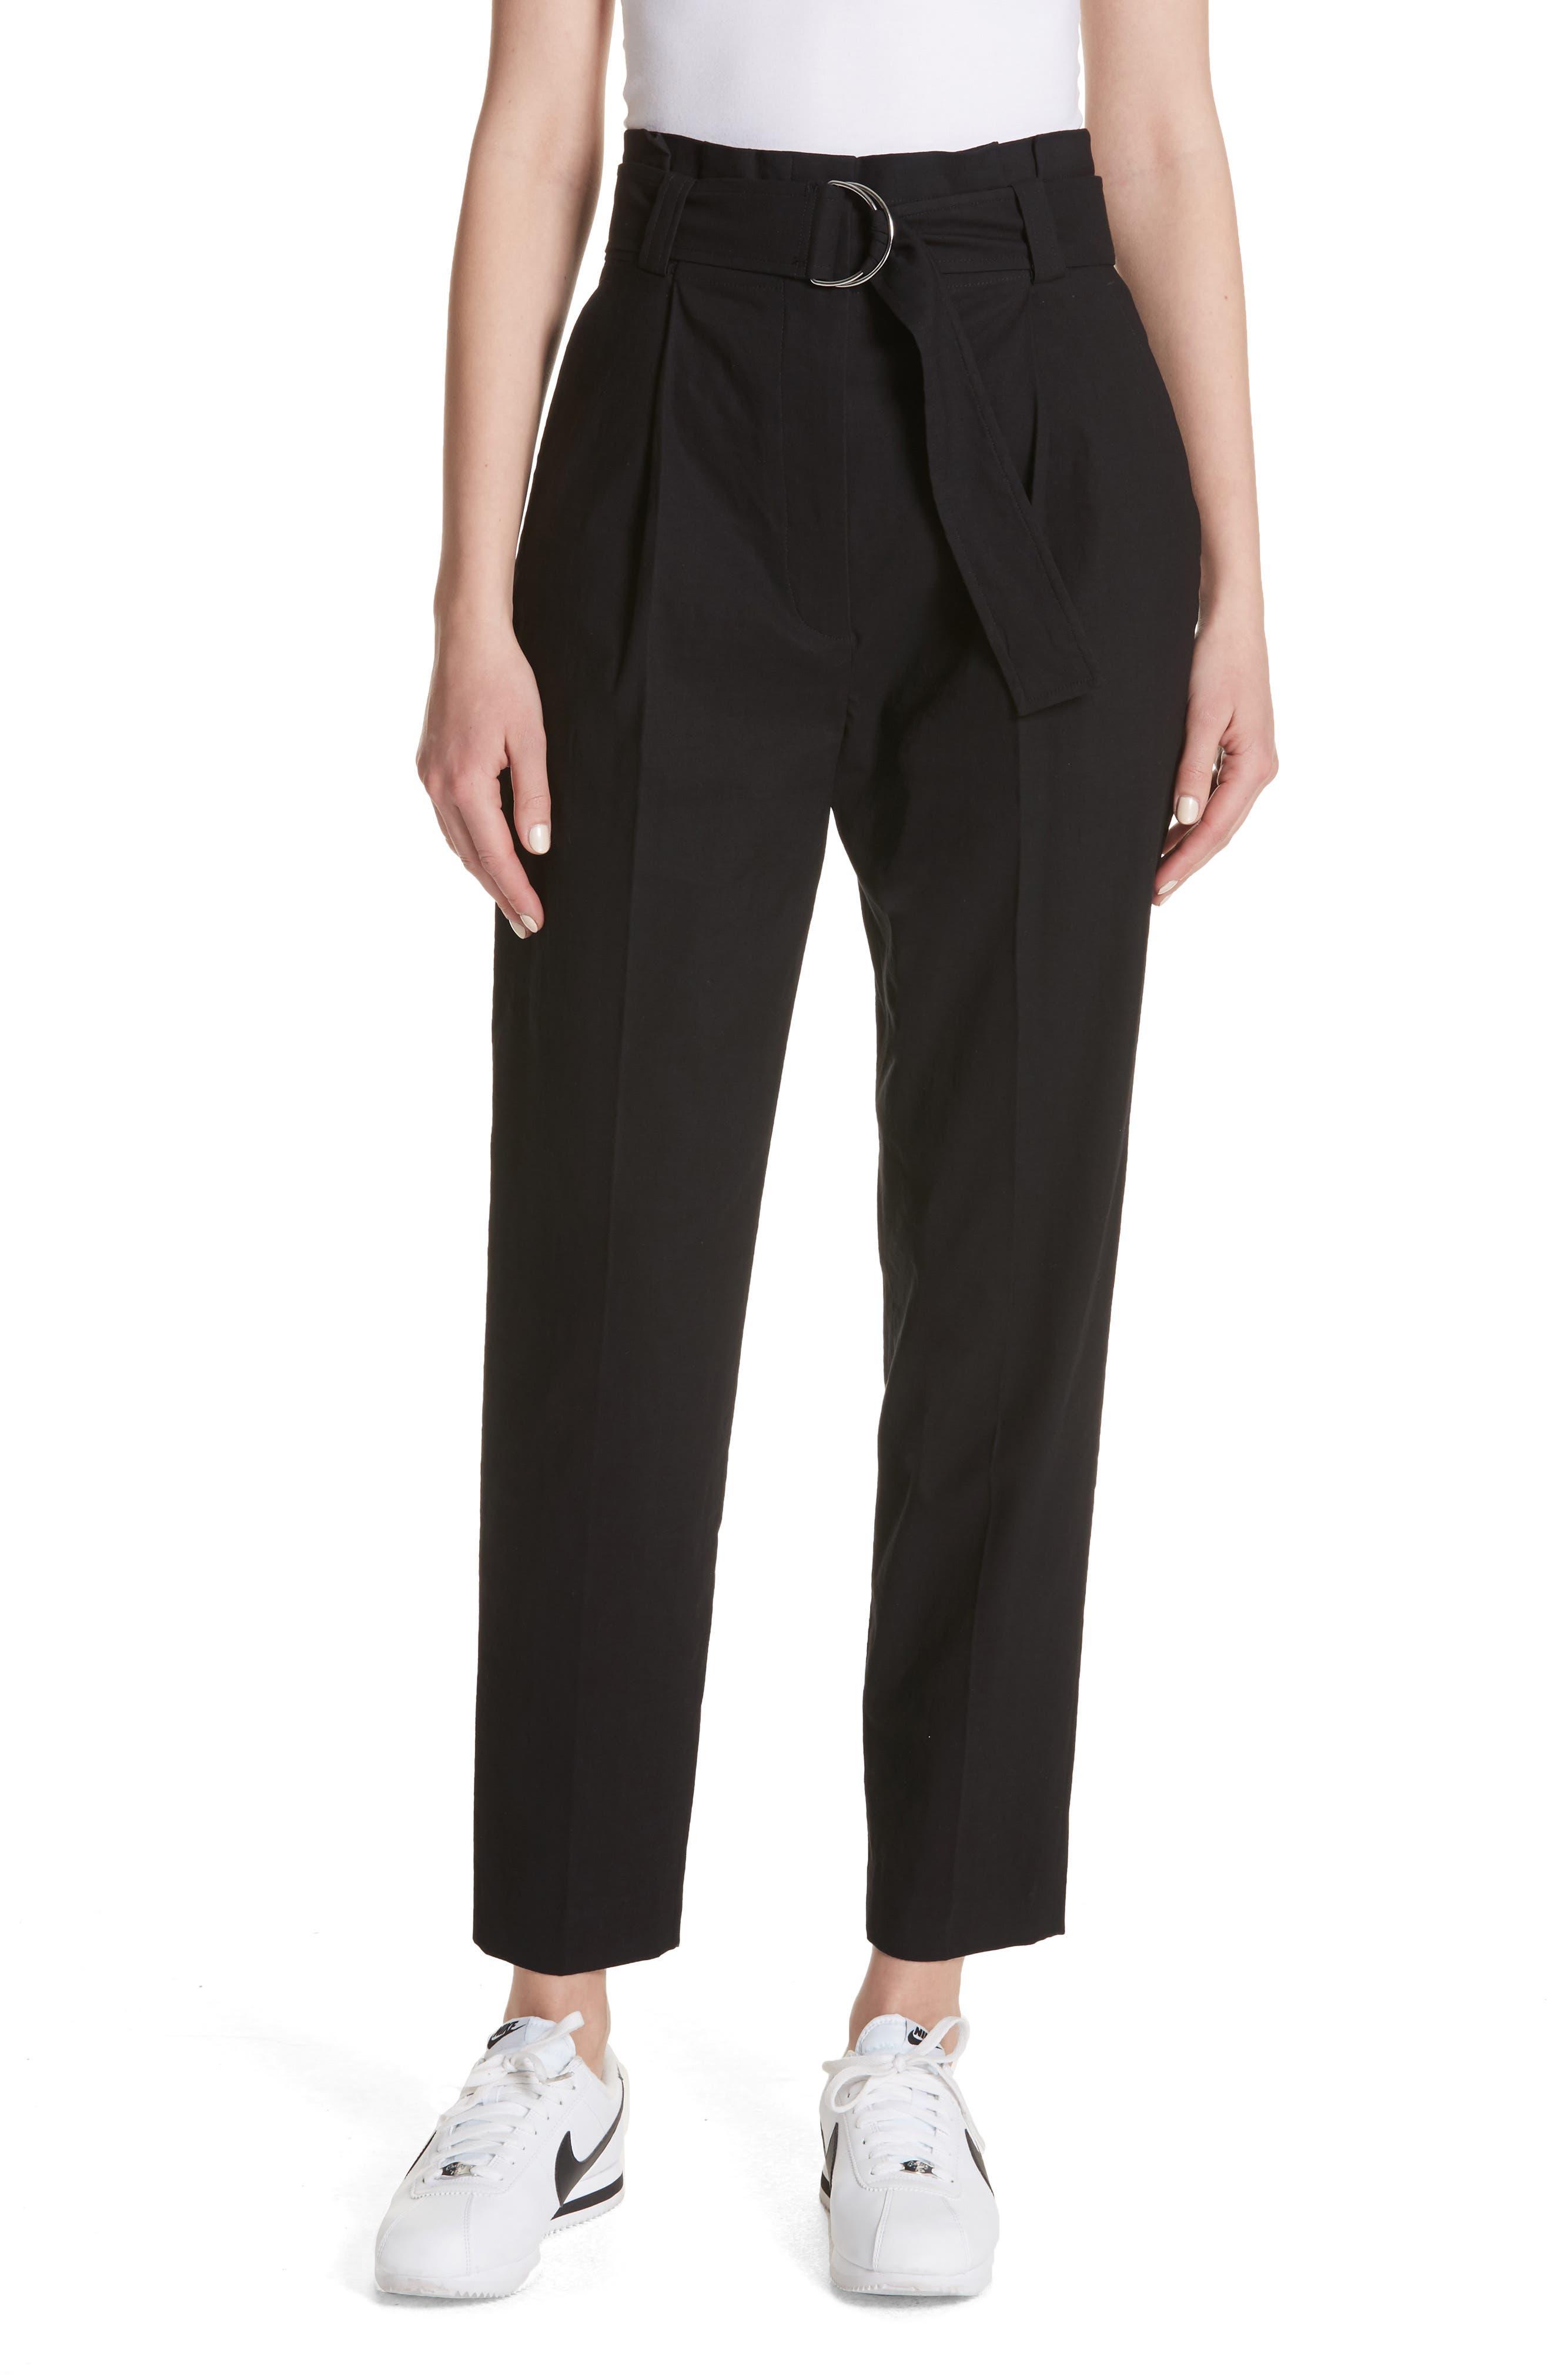 Diego High Waist Pants,                         Main,                         color, Black